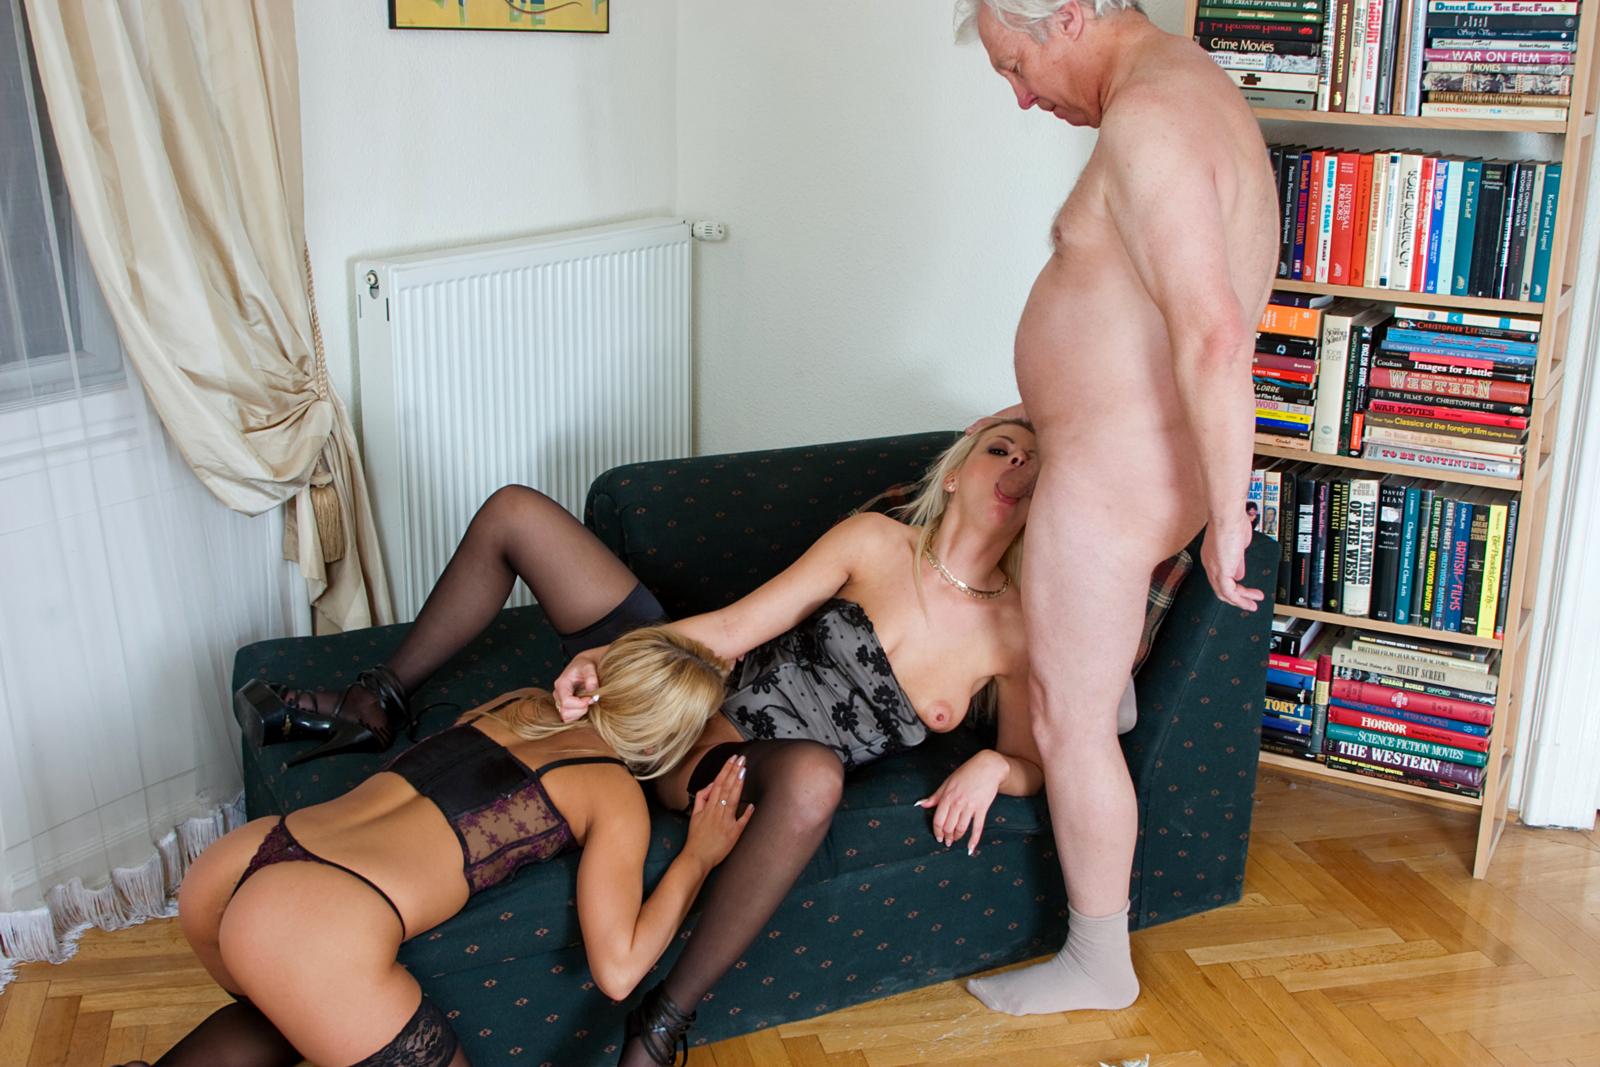 Секс со своими родственниками, Инцест с Родственниками онлайн 4 фотография